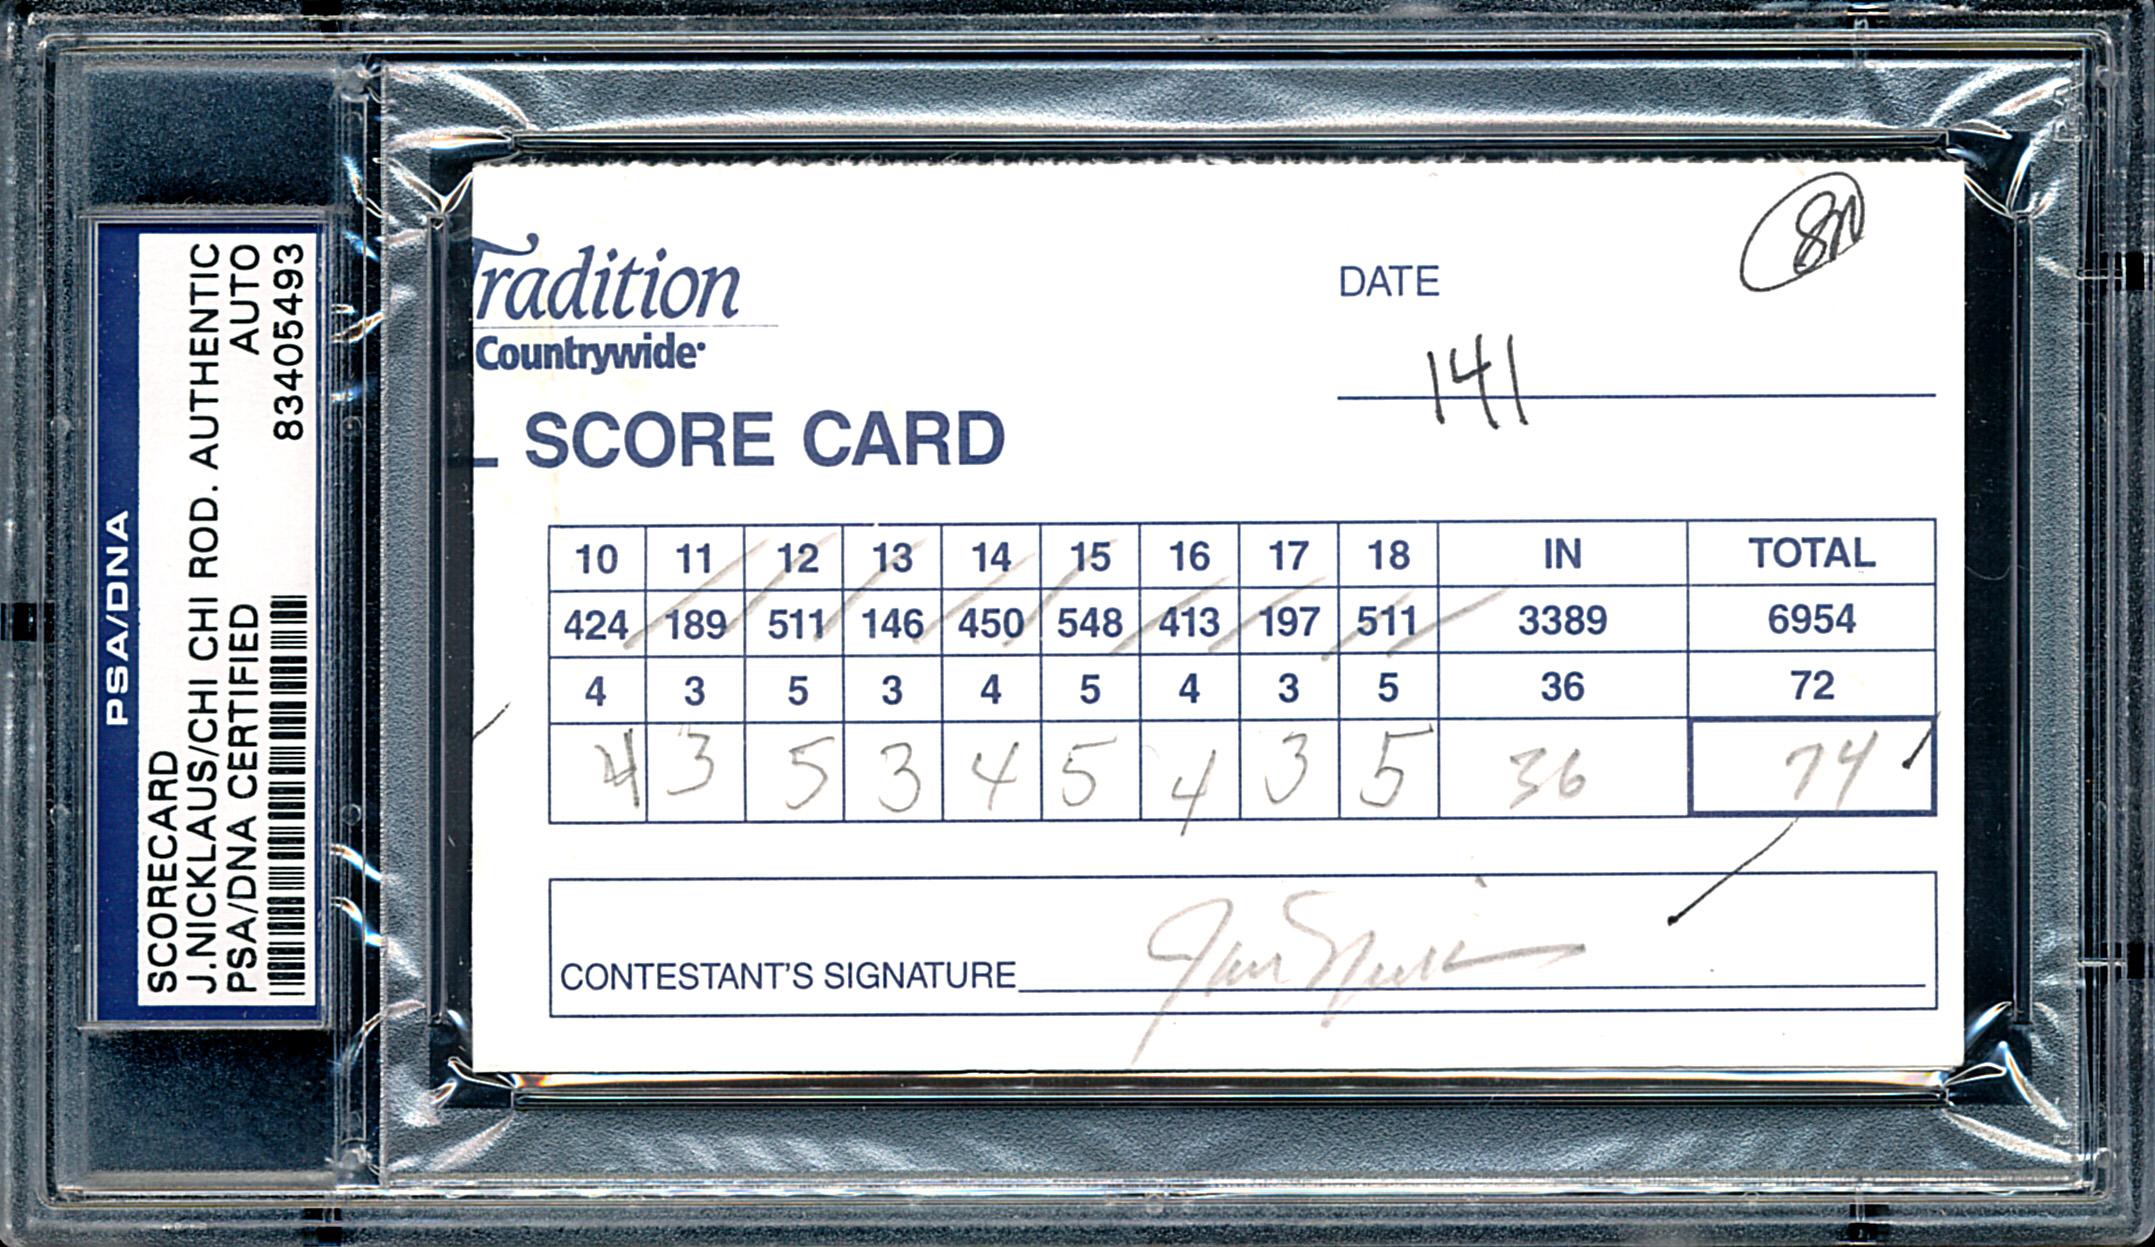 Nicklaus-Rodriguez Scorecard